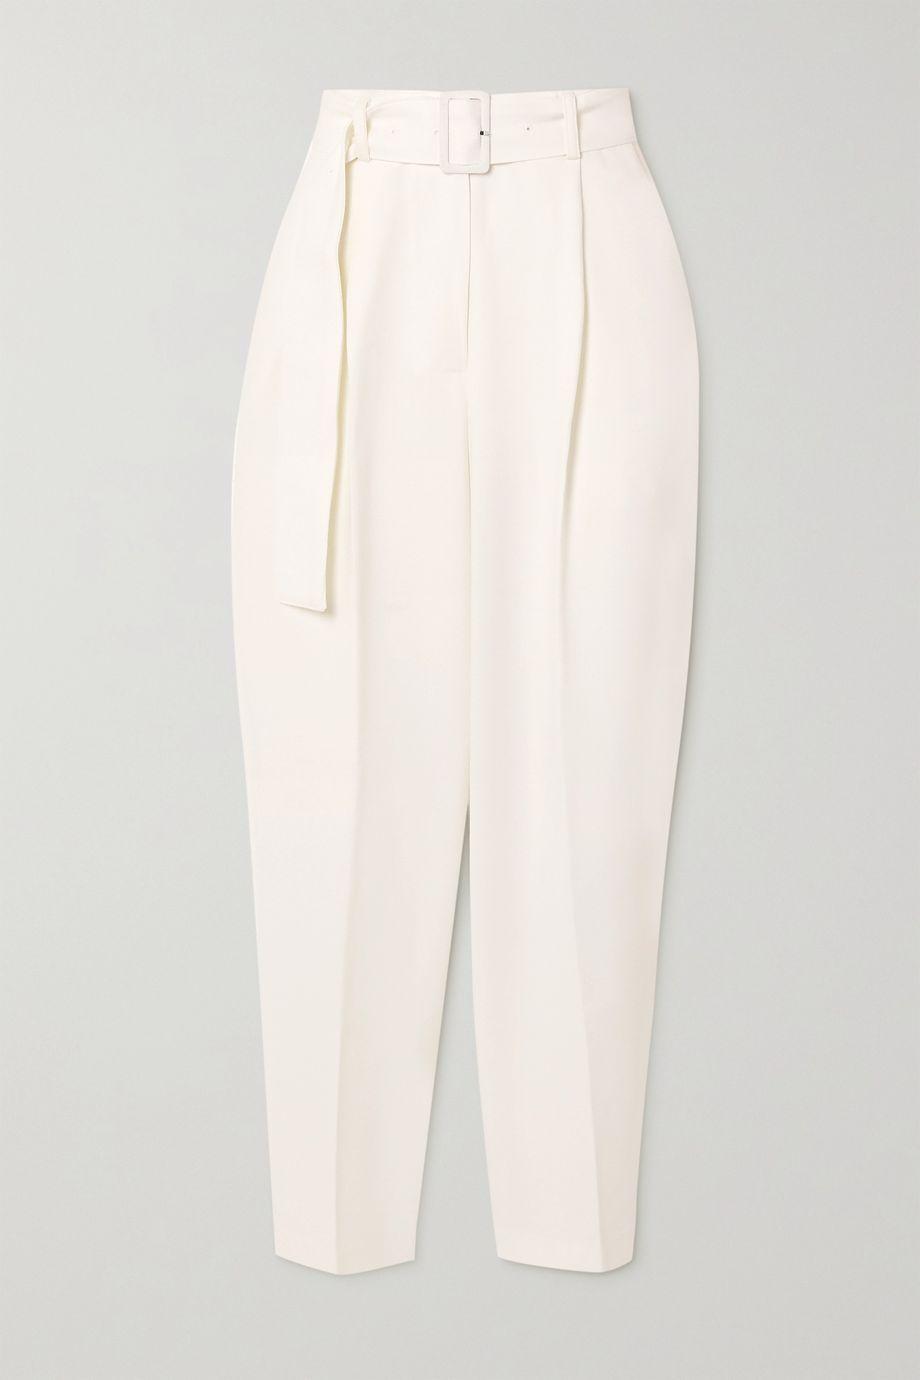 Frankie Shop Elvira belted woven pants